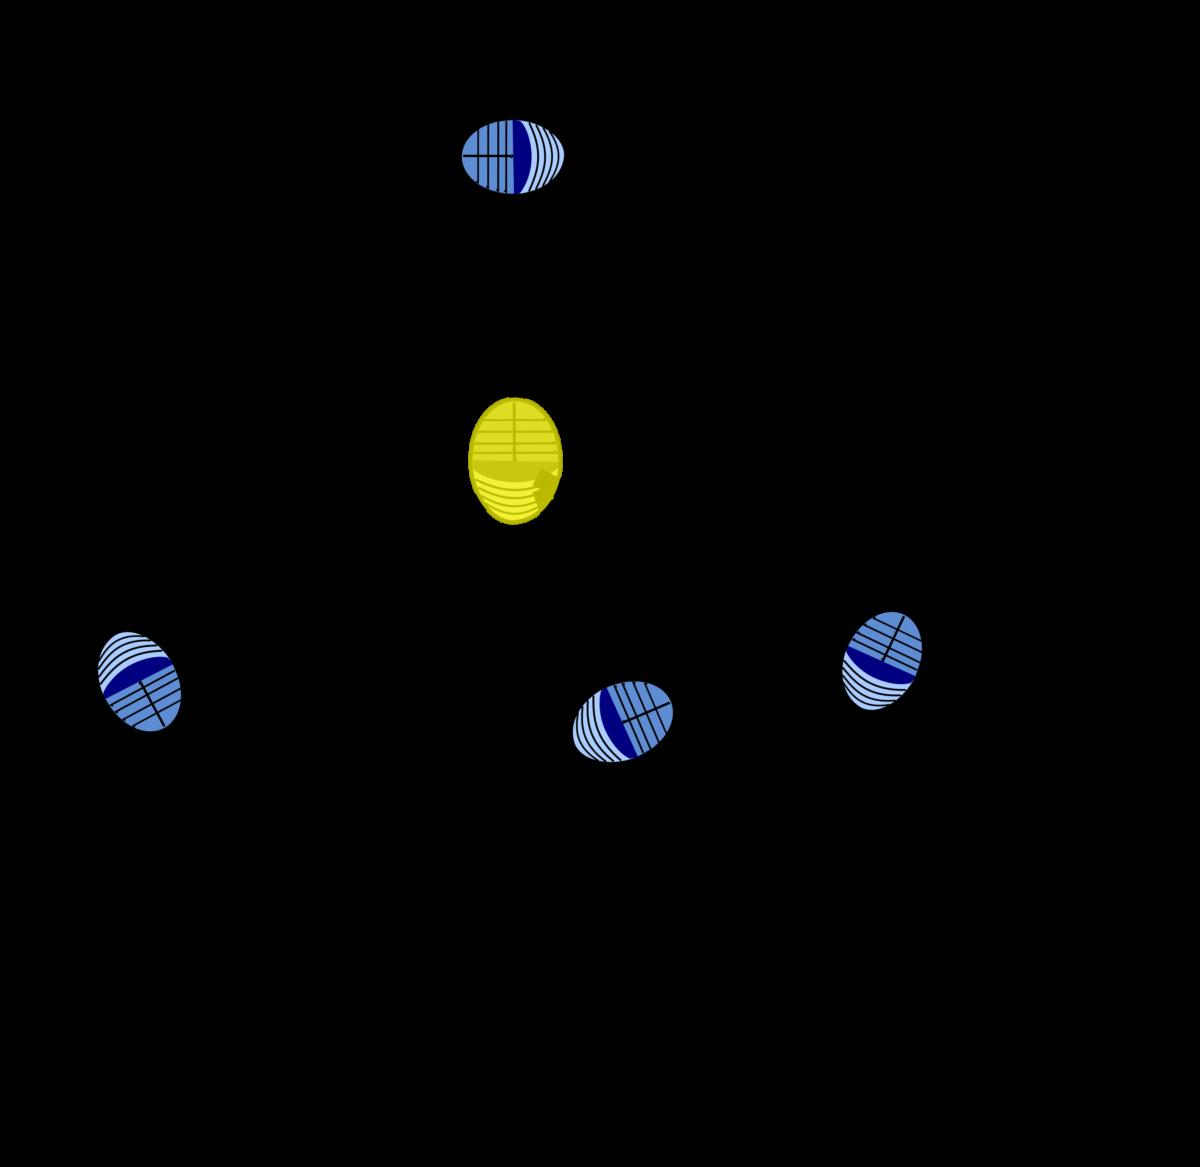 molecular silicate structure